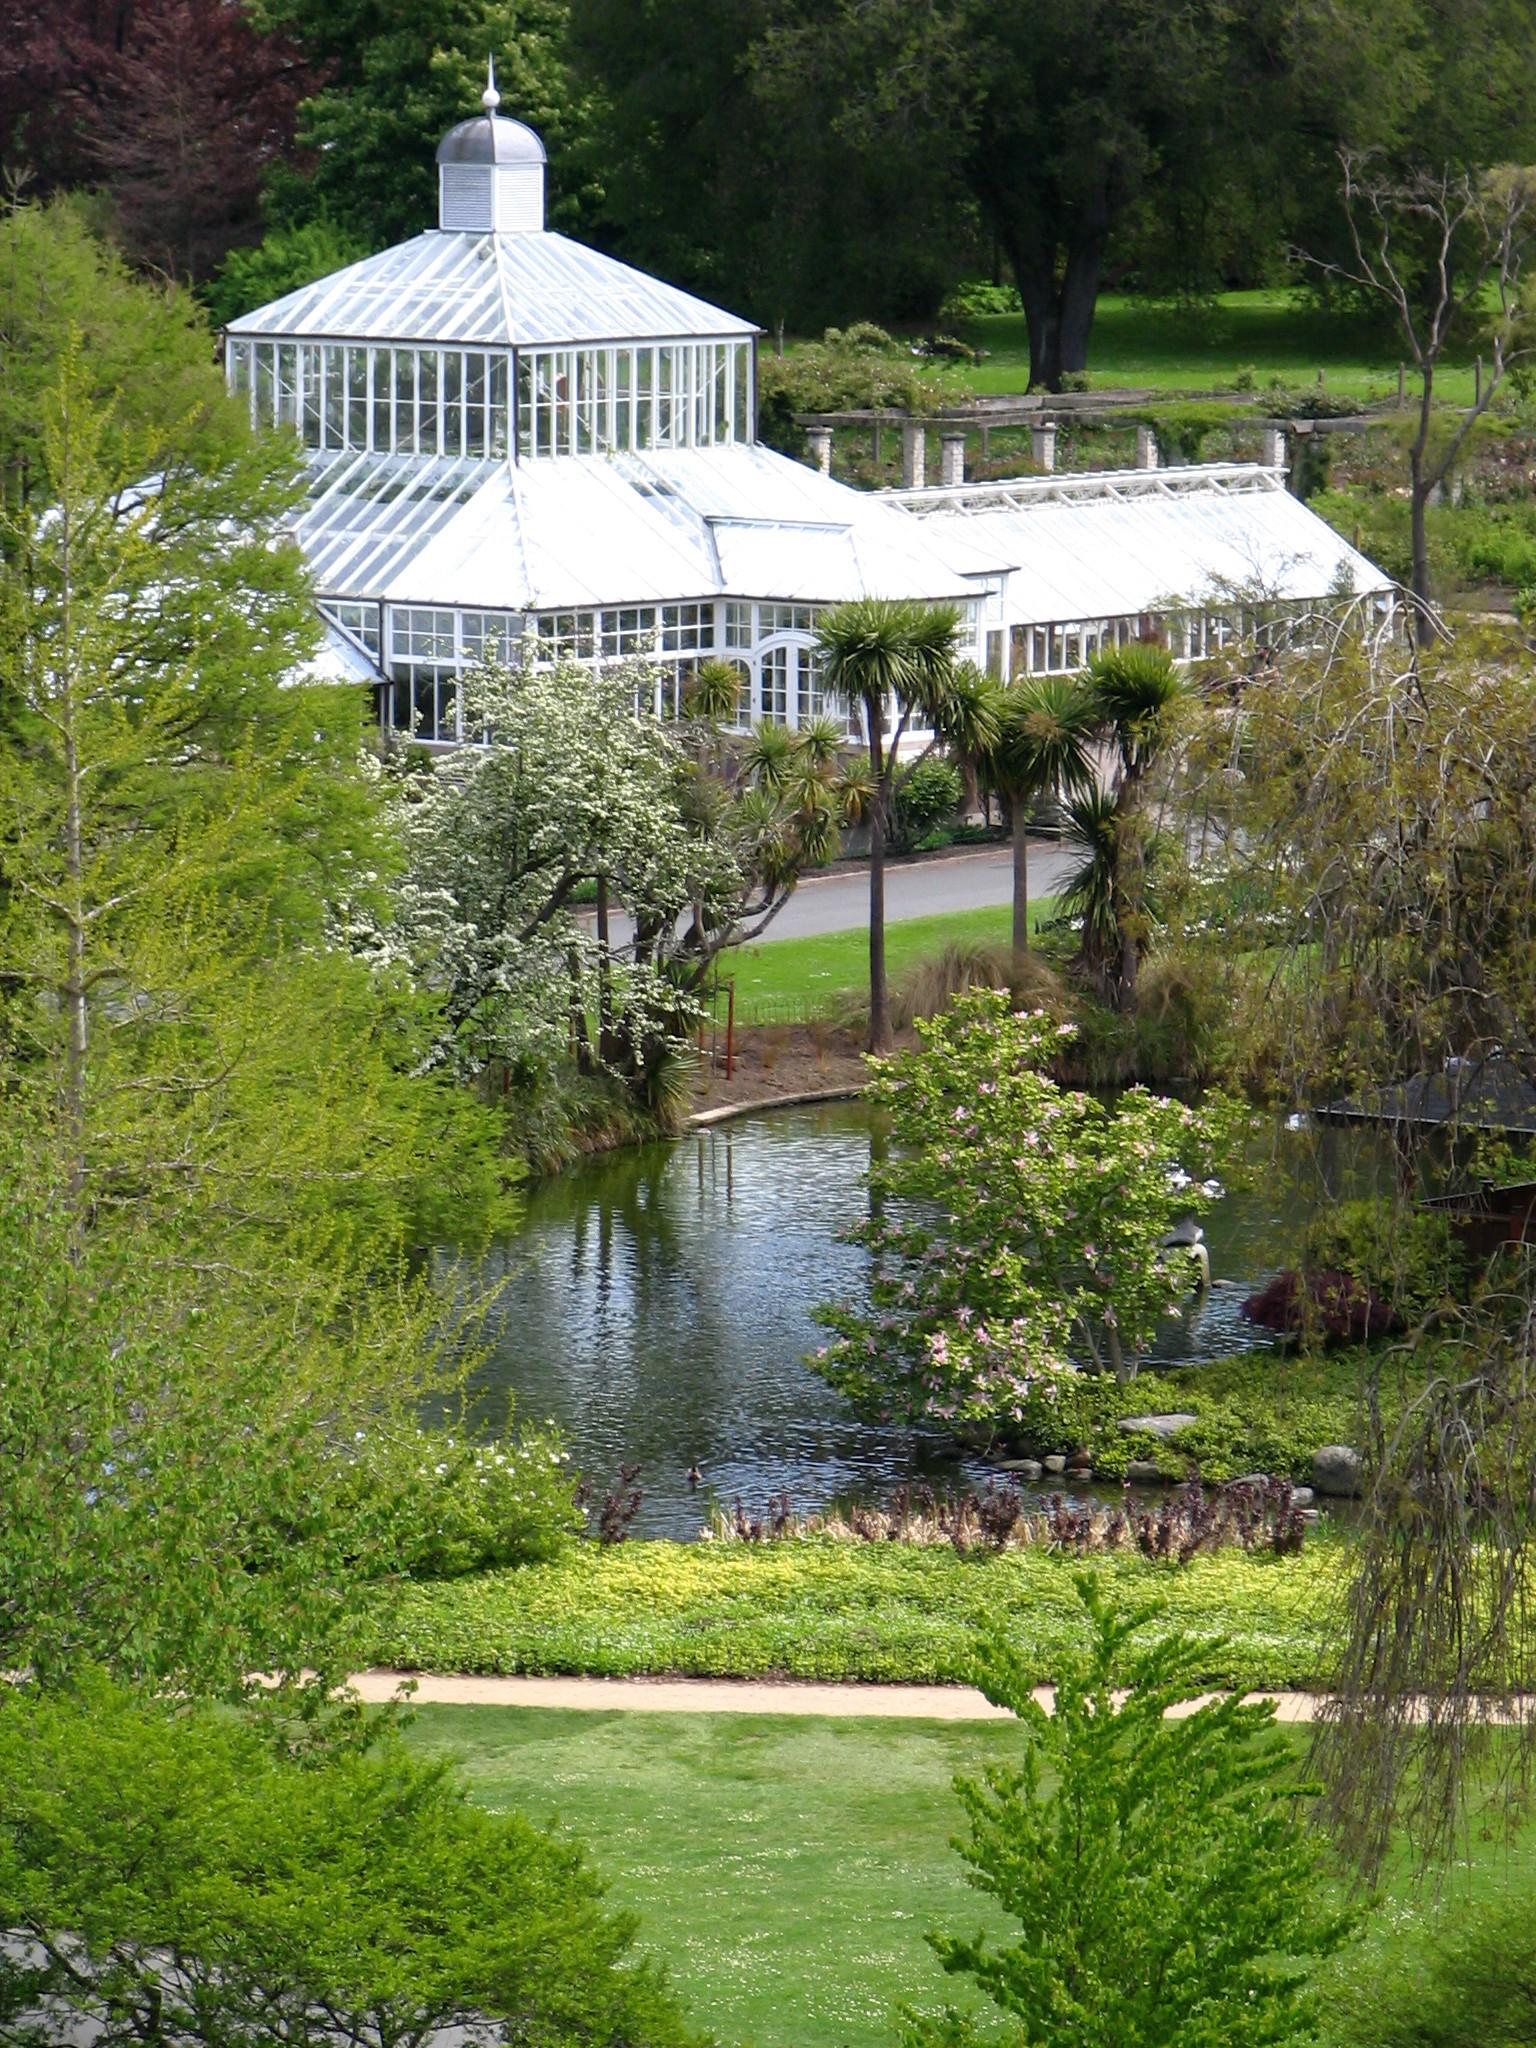 Jardn Botánico de Dunedin la enciclopedia libre